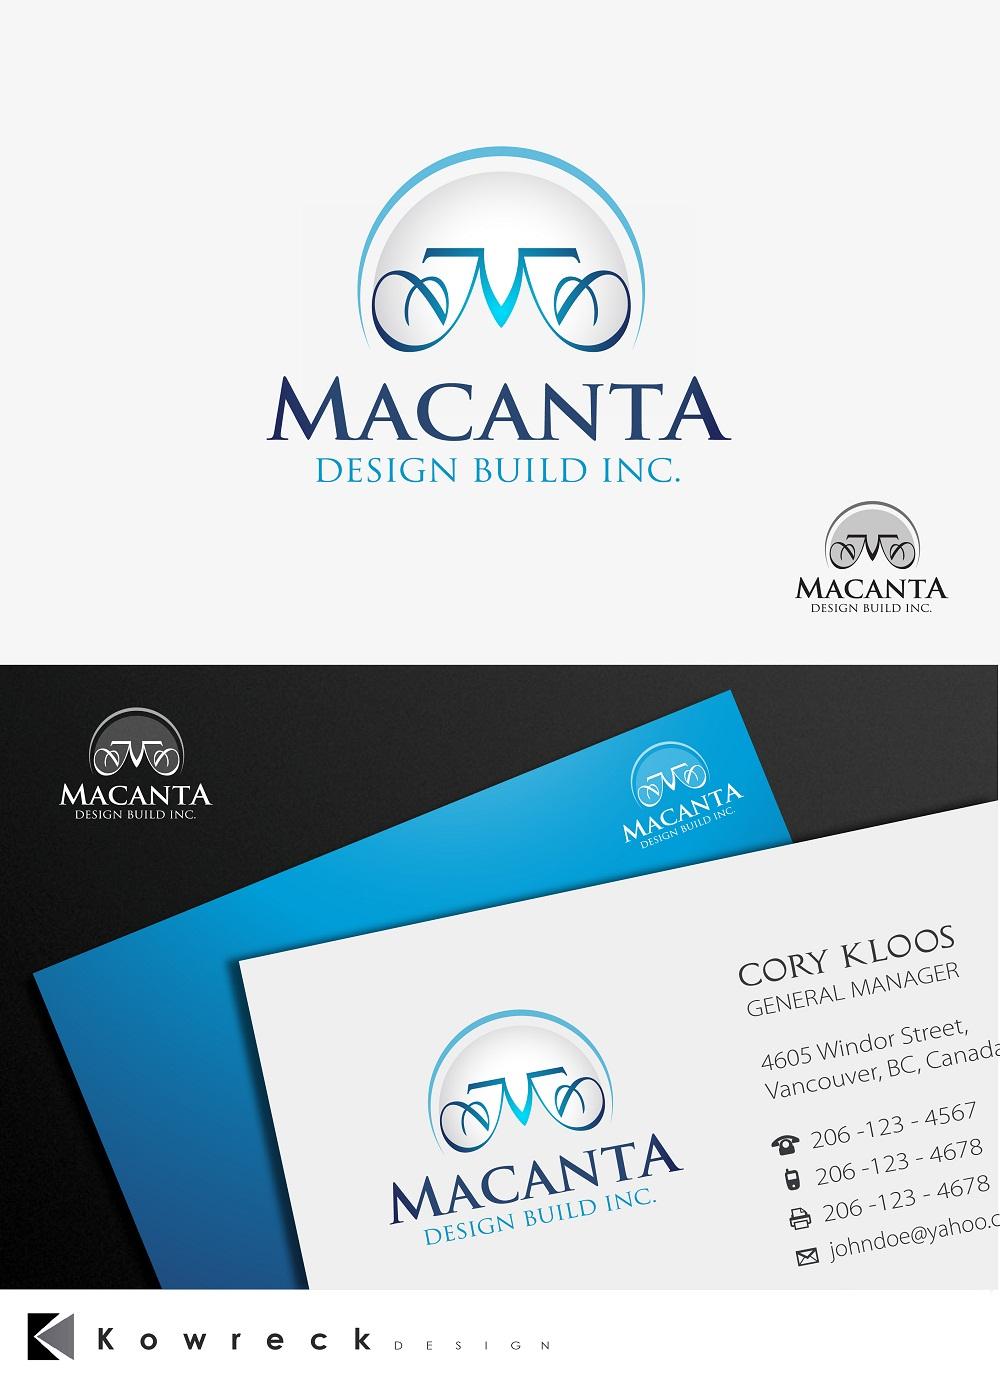 Logo Design by kowreck - Entry No. 167 in the Logo Design Contest Captivating Logo Design for Macanta Design Build Inc.